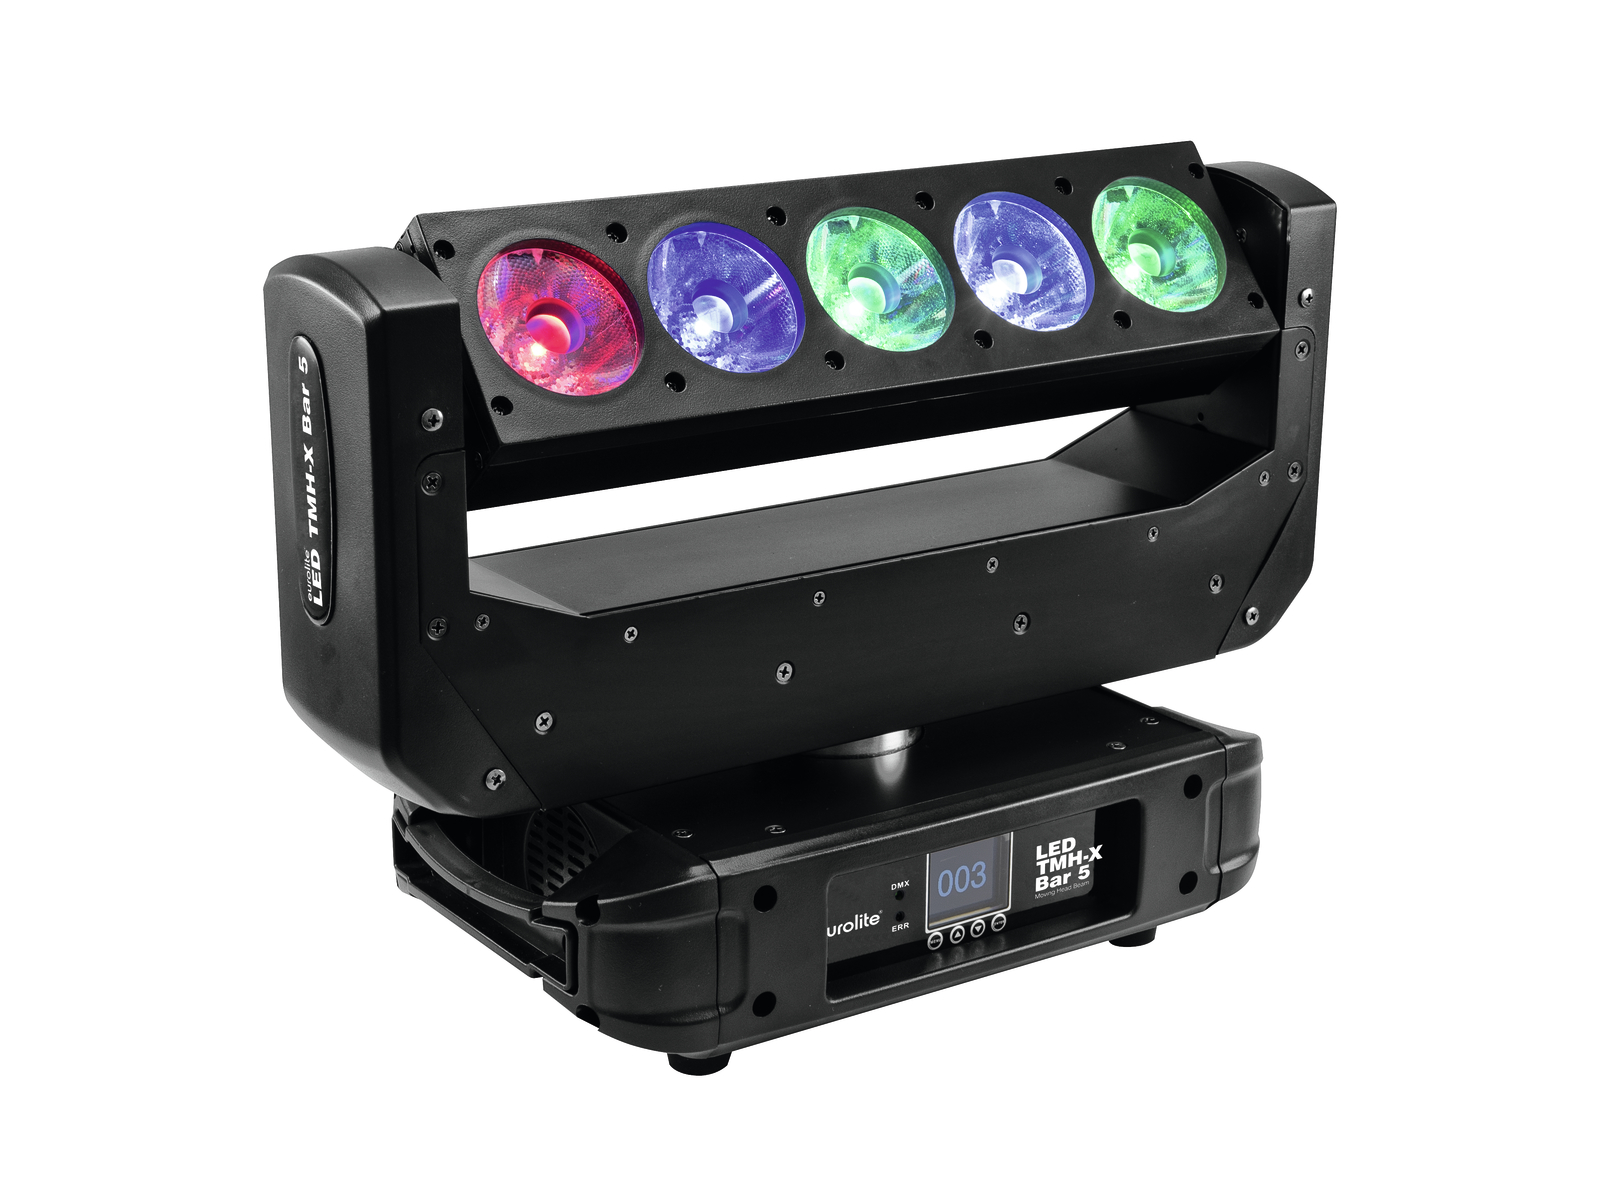 Eurolite LED TMH-X BAR 5, otočná hlavice/lišta, 5x15W RGBW LED, DM